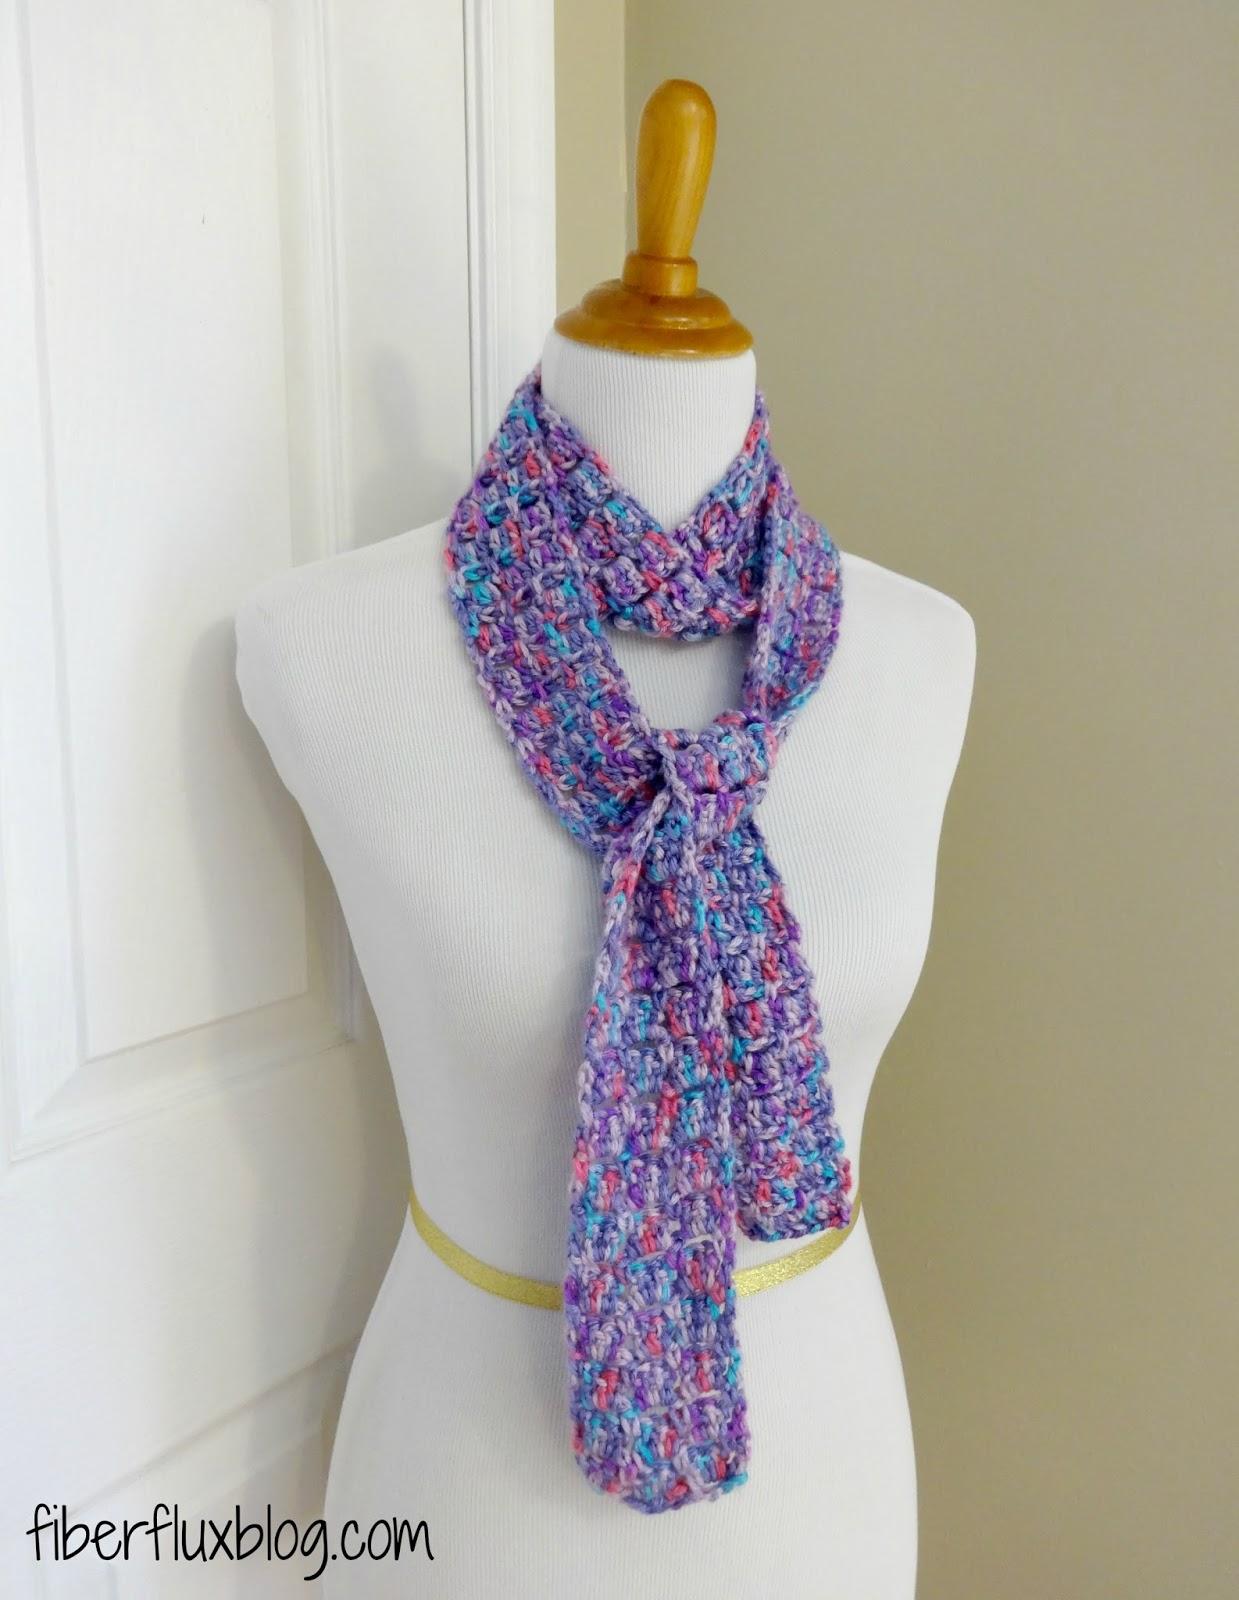 Fiber Flux: Free Crochet Pattern...Sugar Violet Skinny Scarf!